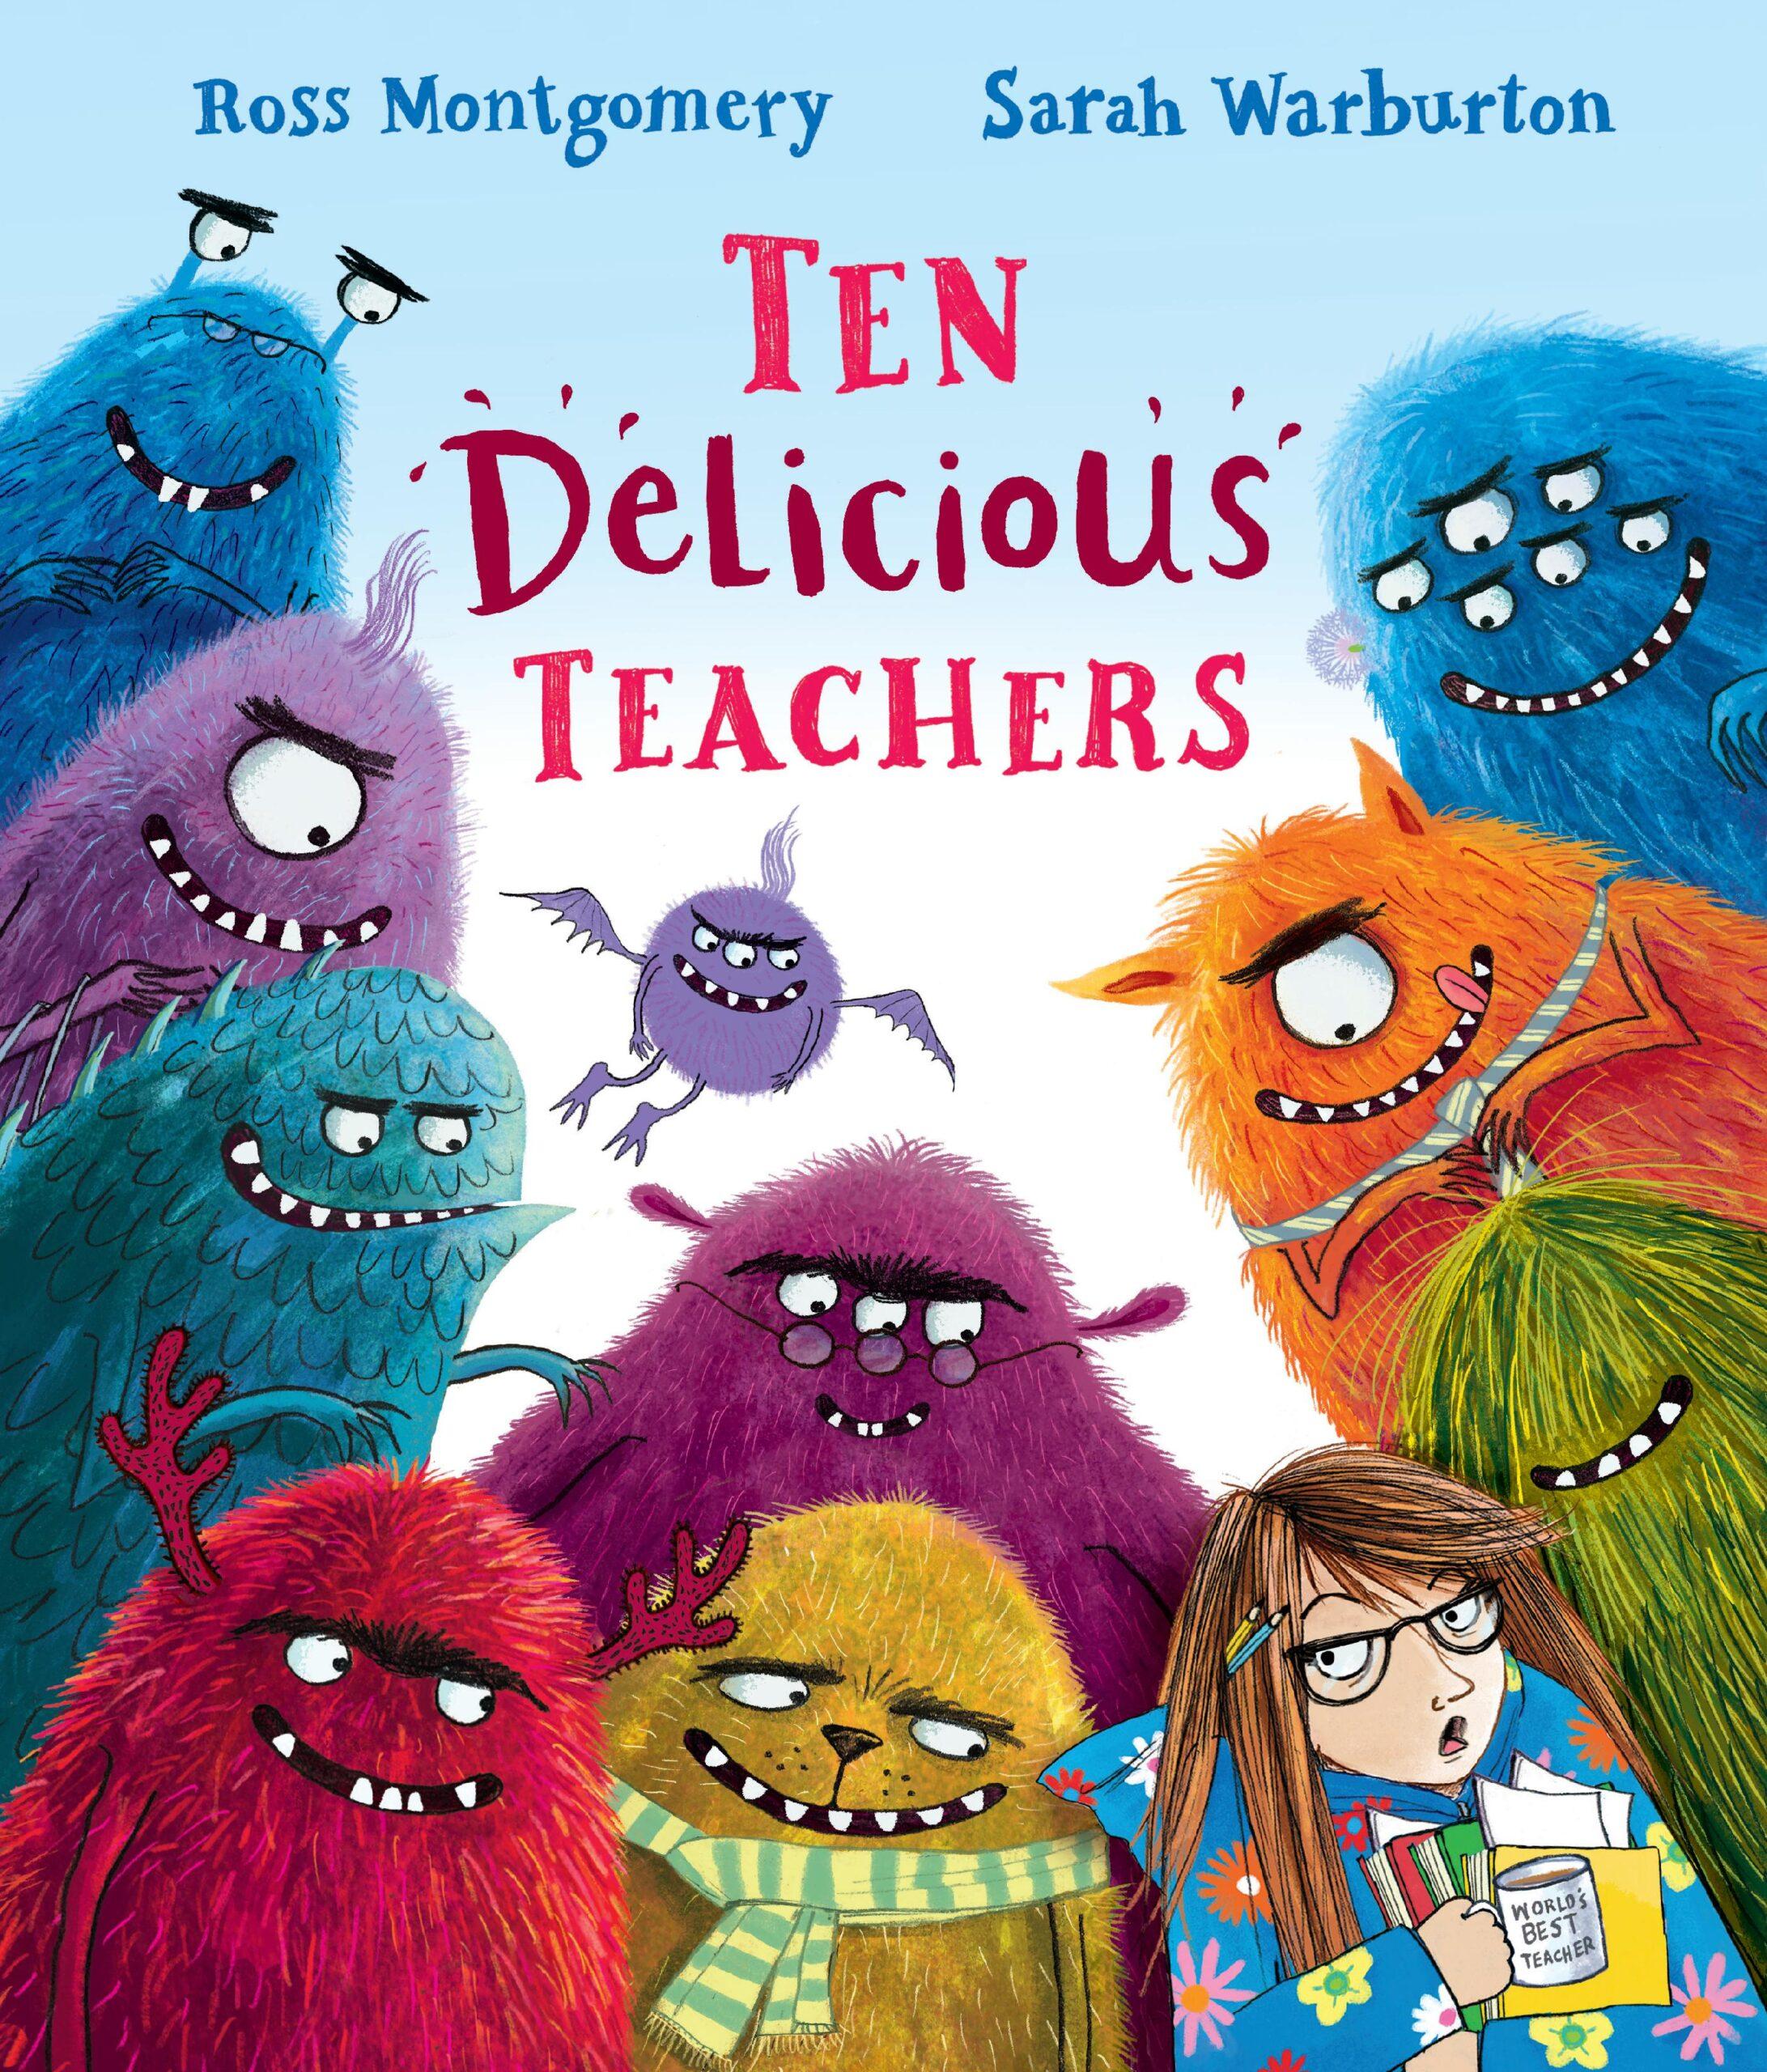 Ten Delicious Teachers